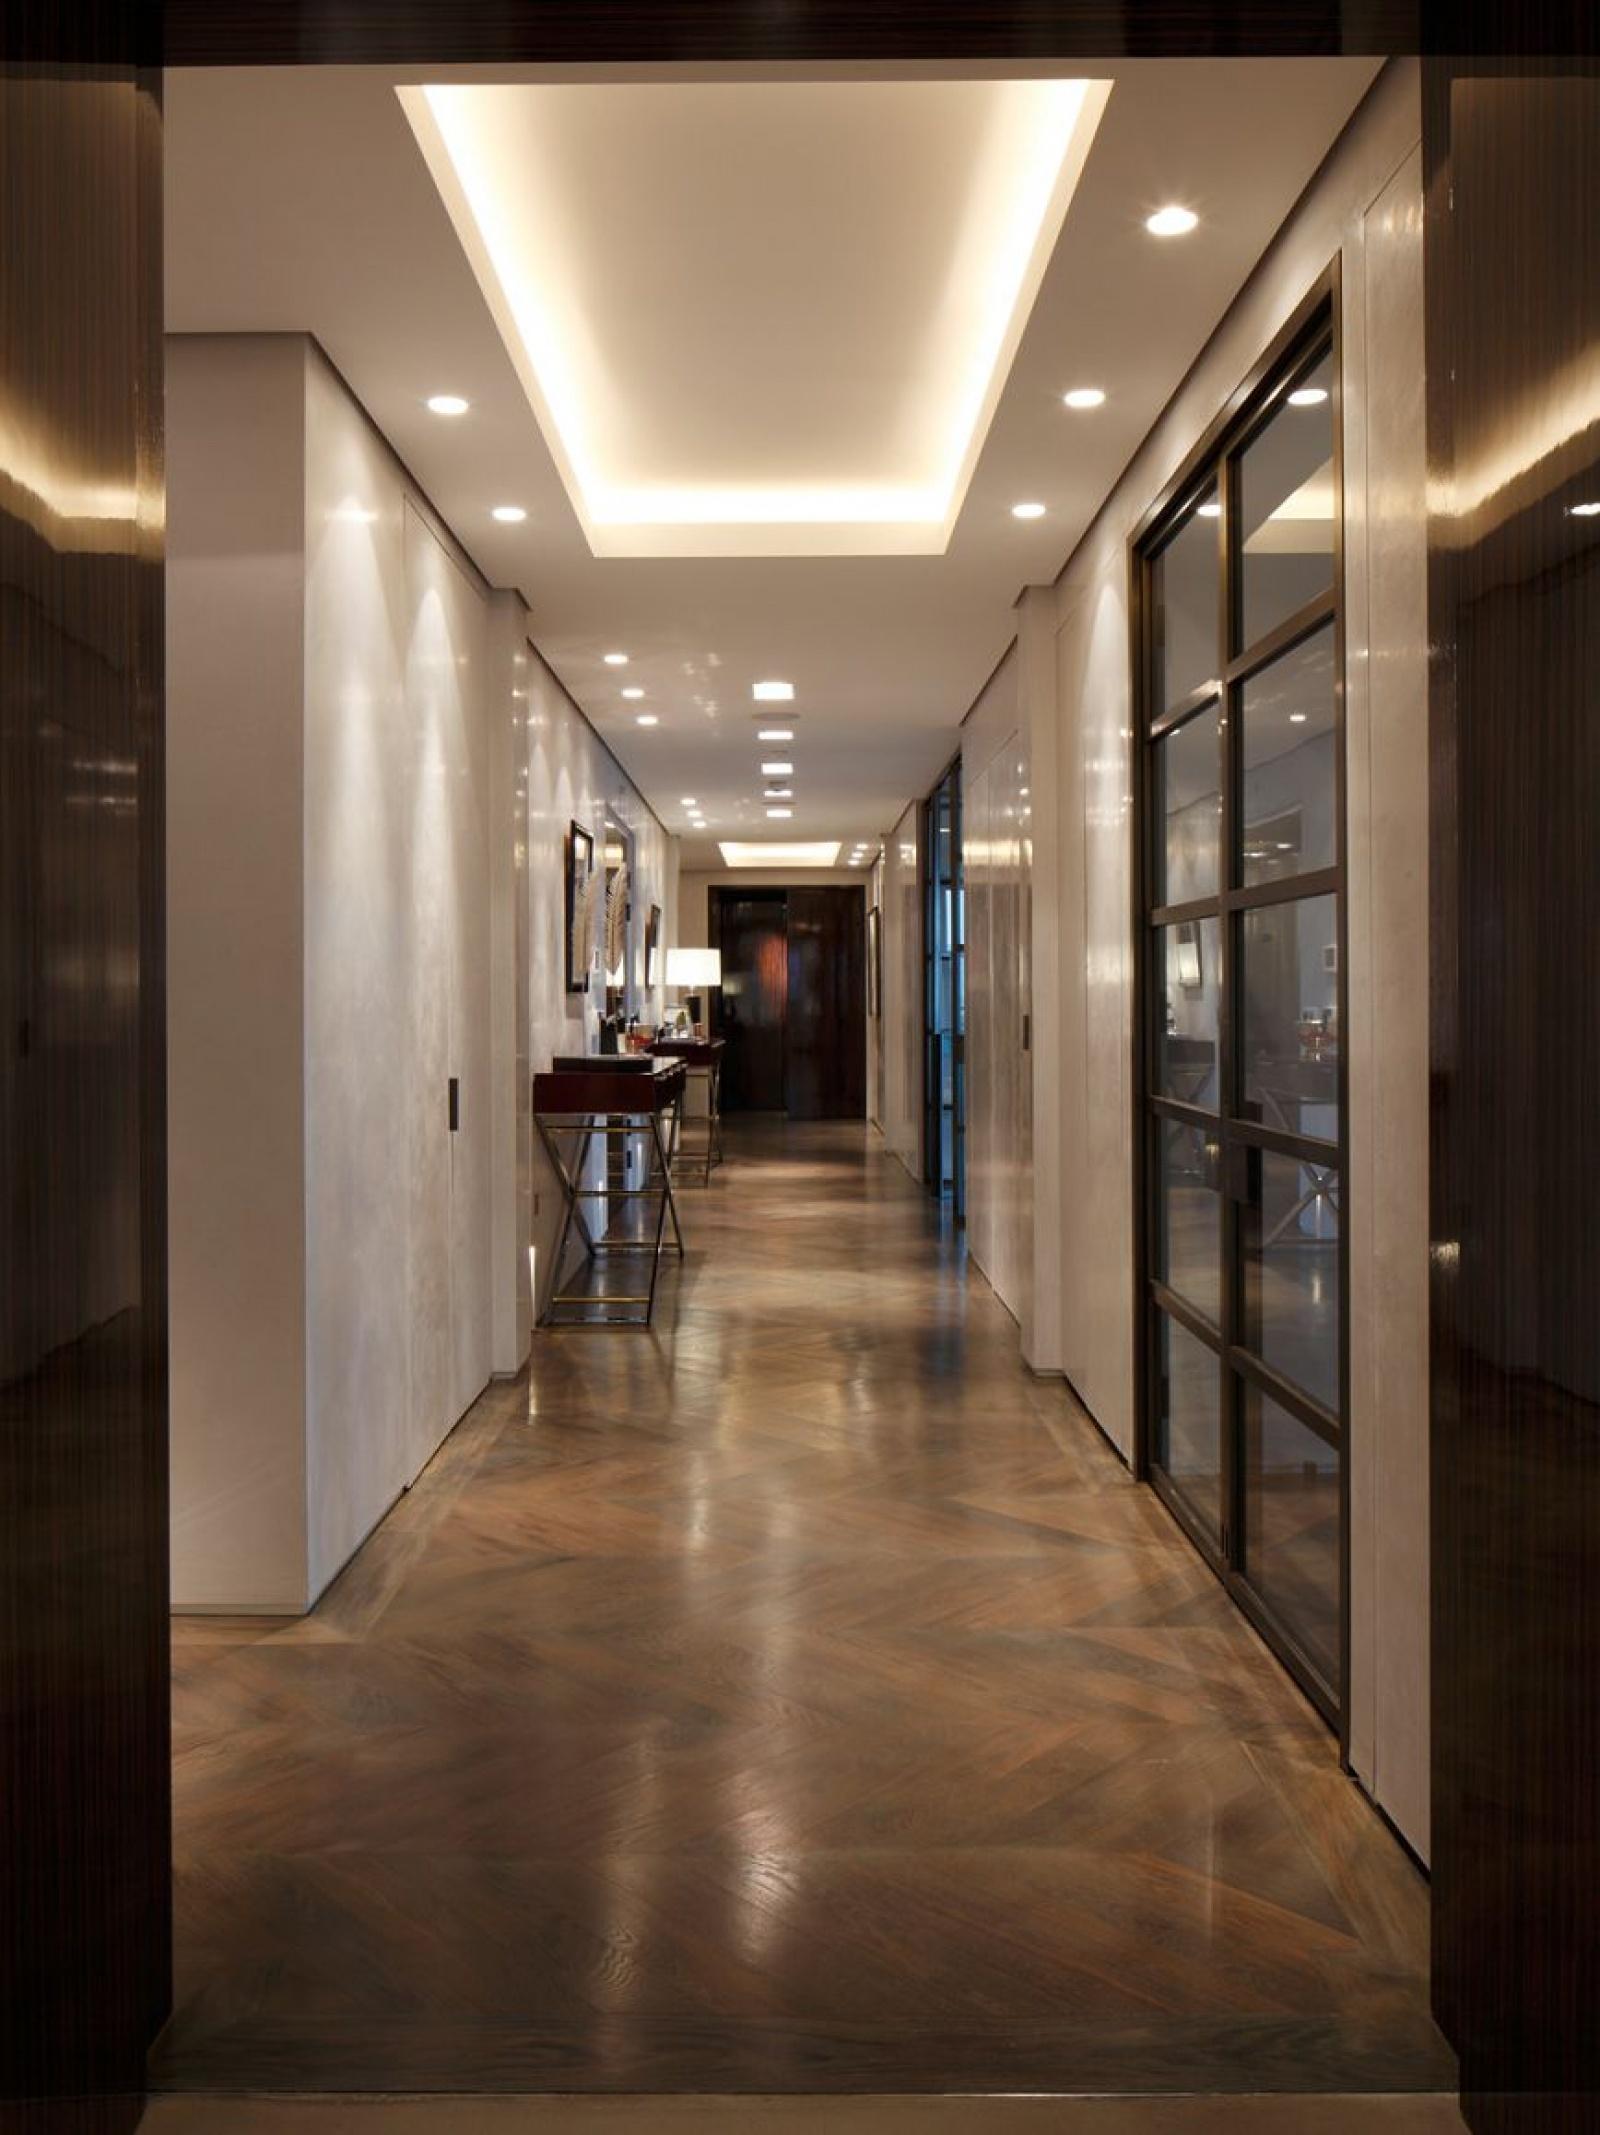 Casa forma design portfolio kensington place kensington for Office hallway design